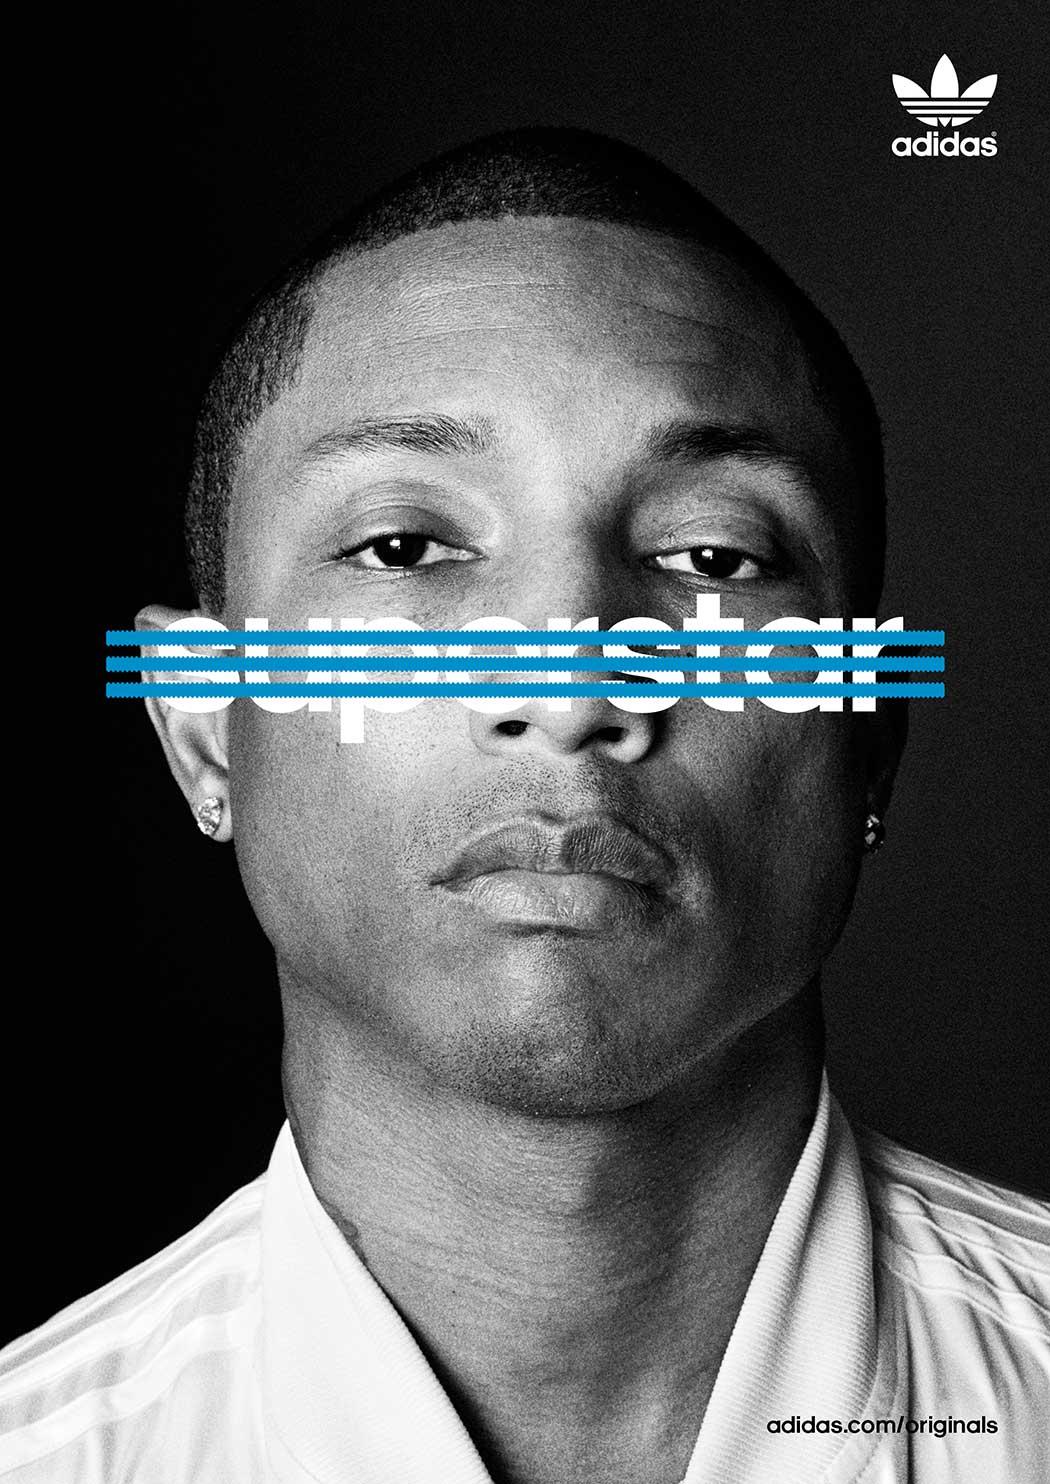 adidas, originals, superstar, pharrell williams, ultimate spotlight, ultimate spotlight magazine, usl magazine, uslmag, uslmag.com, atlanta fashion magazine